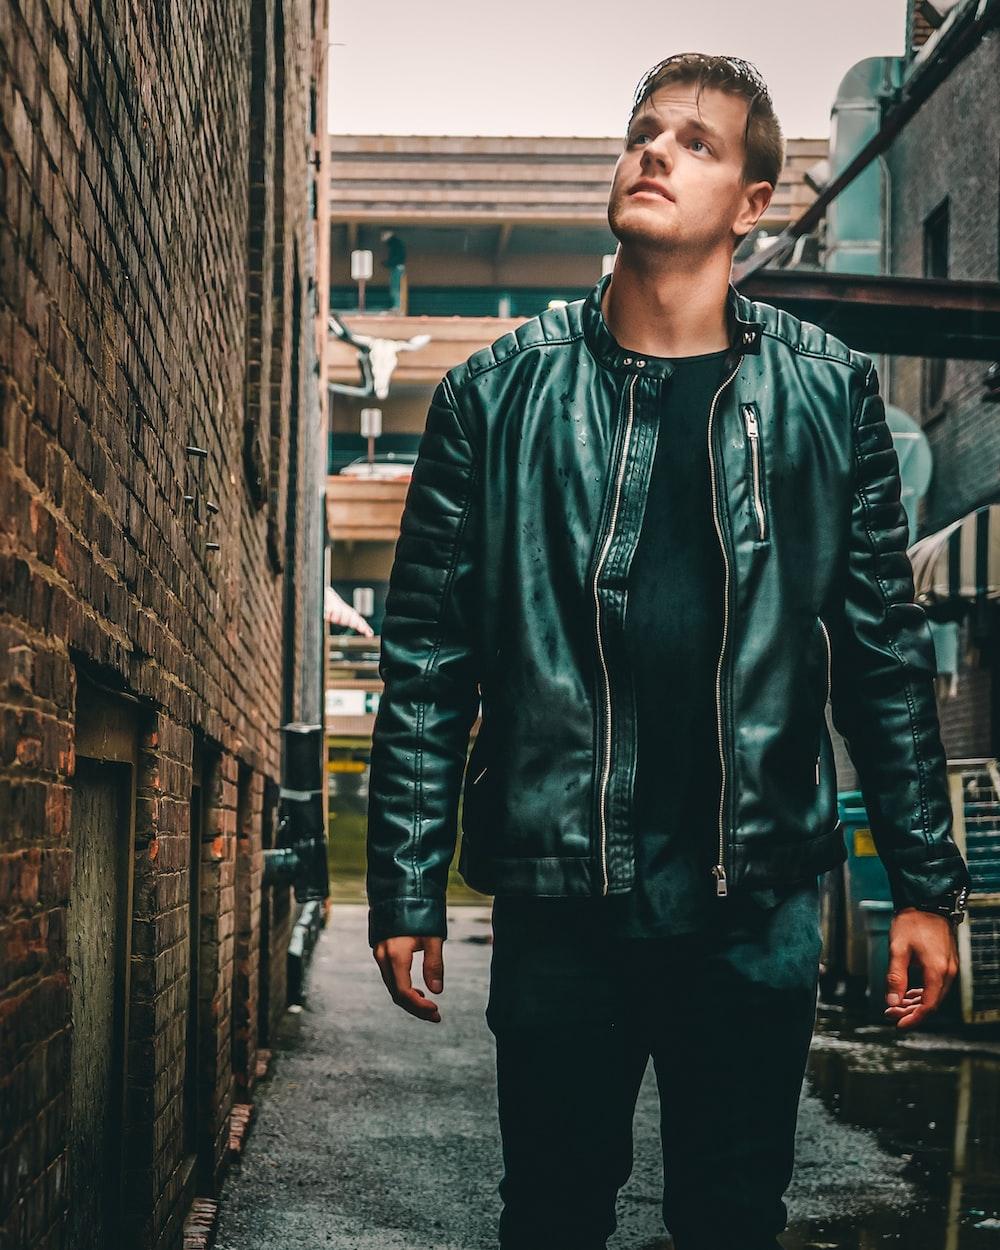 man in green zip up jacket standing beside brick wall